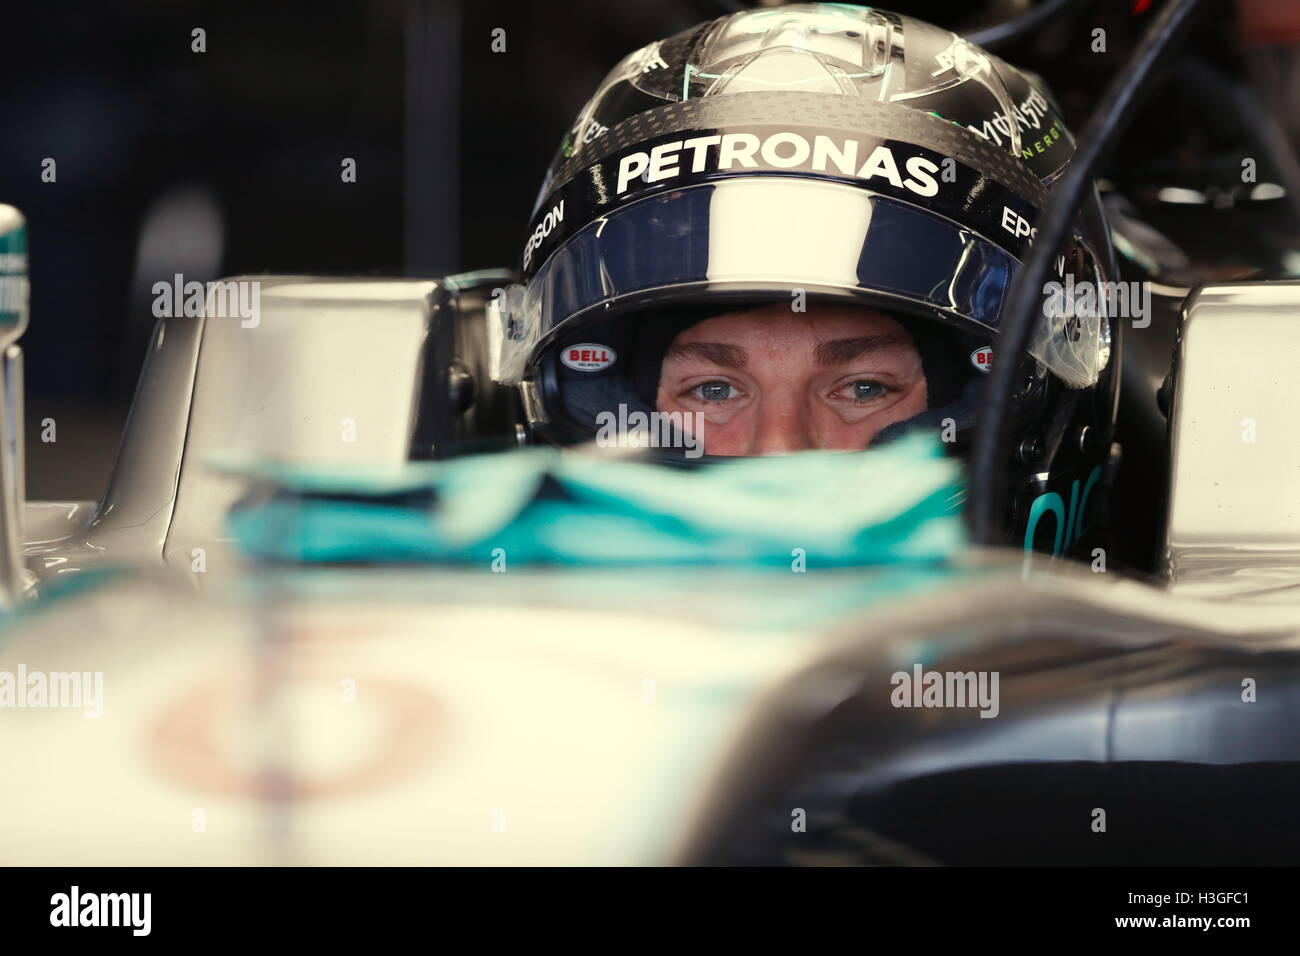 Suzuka, au Japon. 8 octobre 2016. Nico Rosberg (GER) F1: Grand Prix du Japon à Suzuka Circuit dans Suzuka, Japon . Credit: Sho Tamura/AFLO SPORT/Alamy Live News Banque D'Images